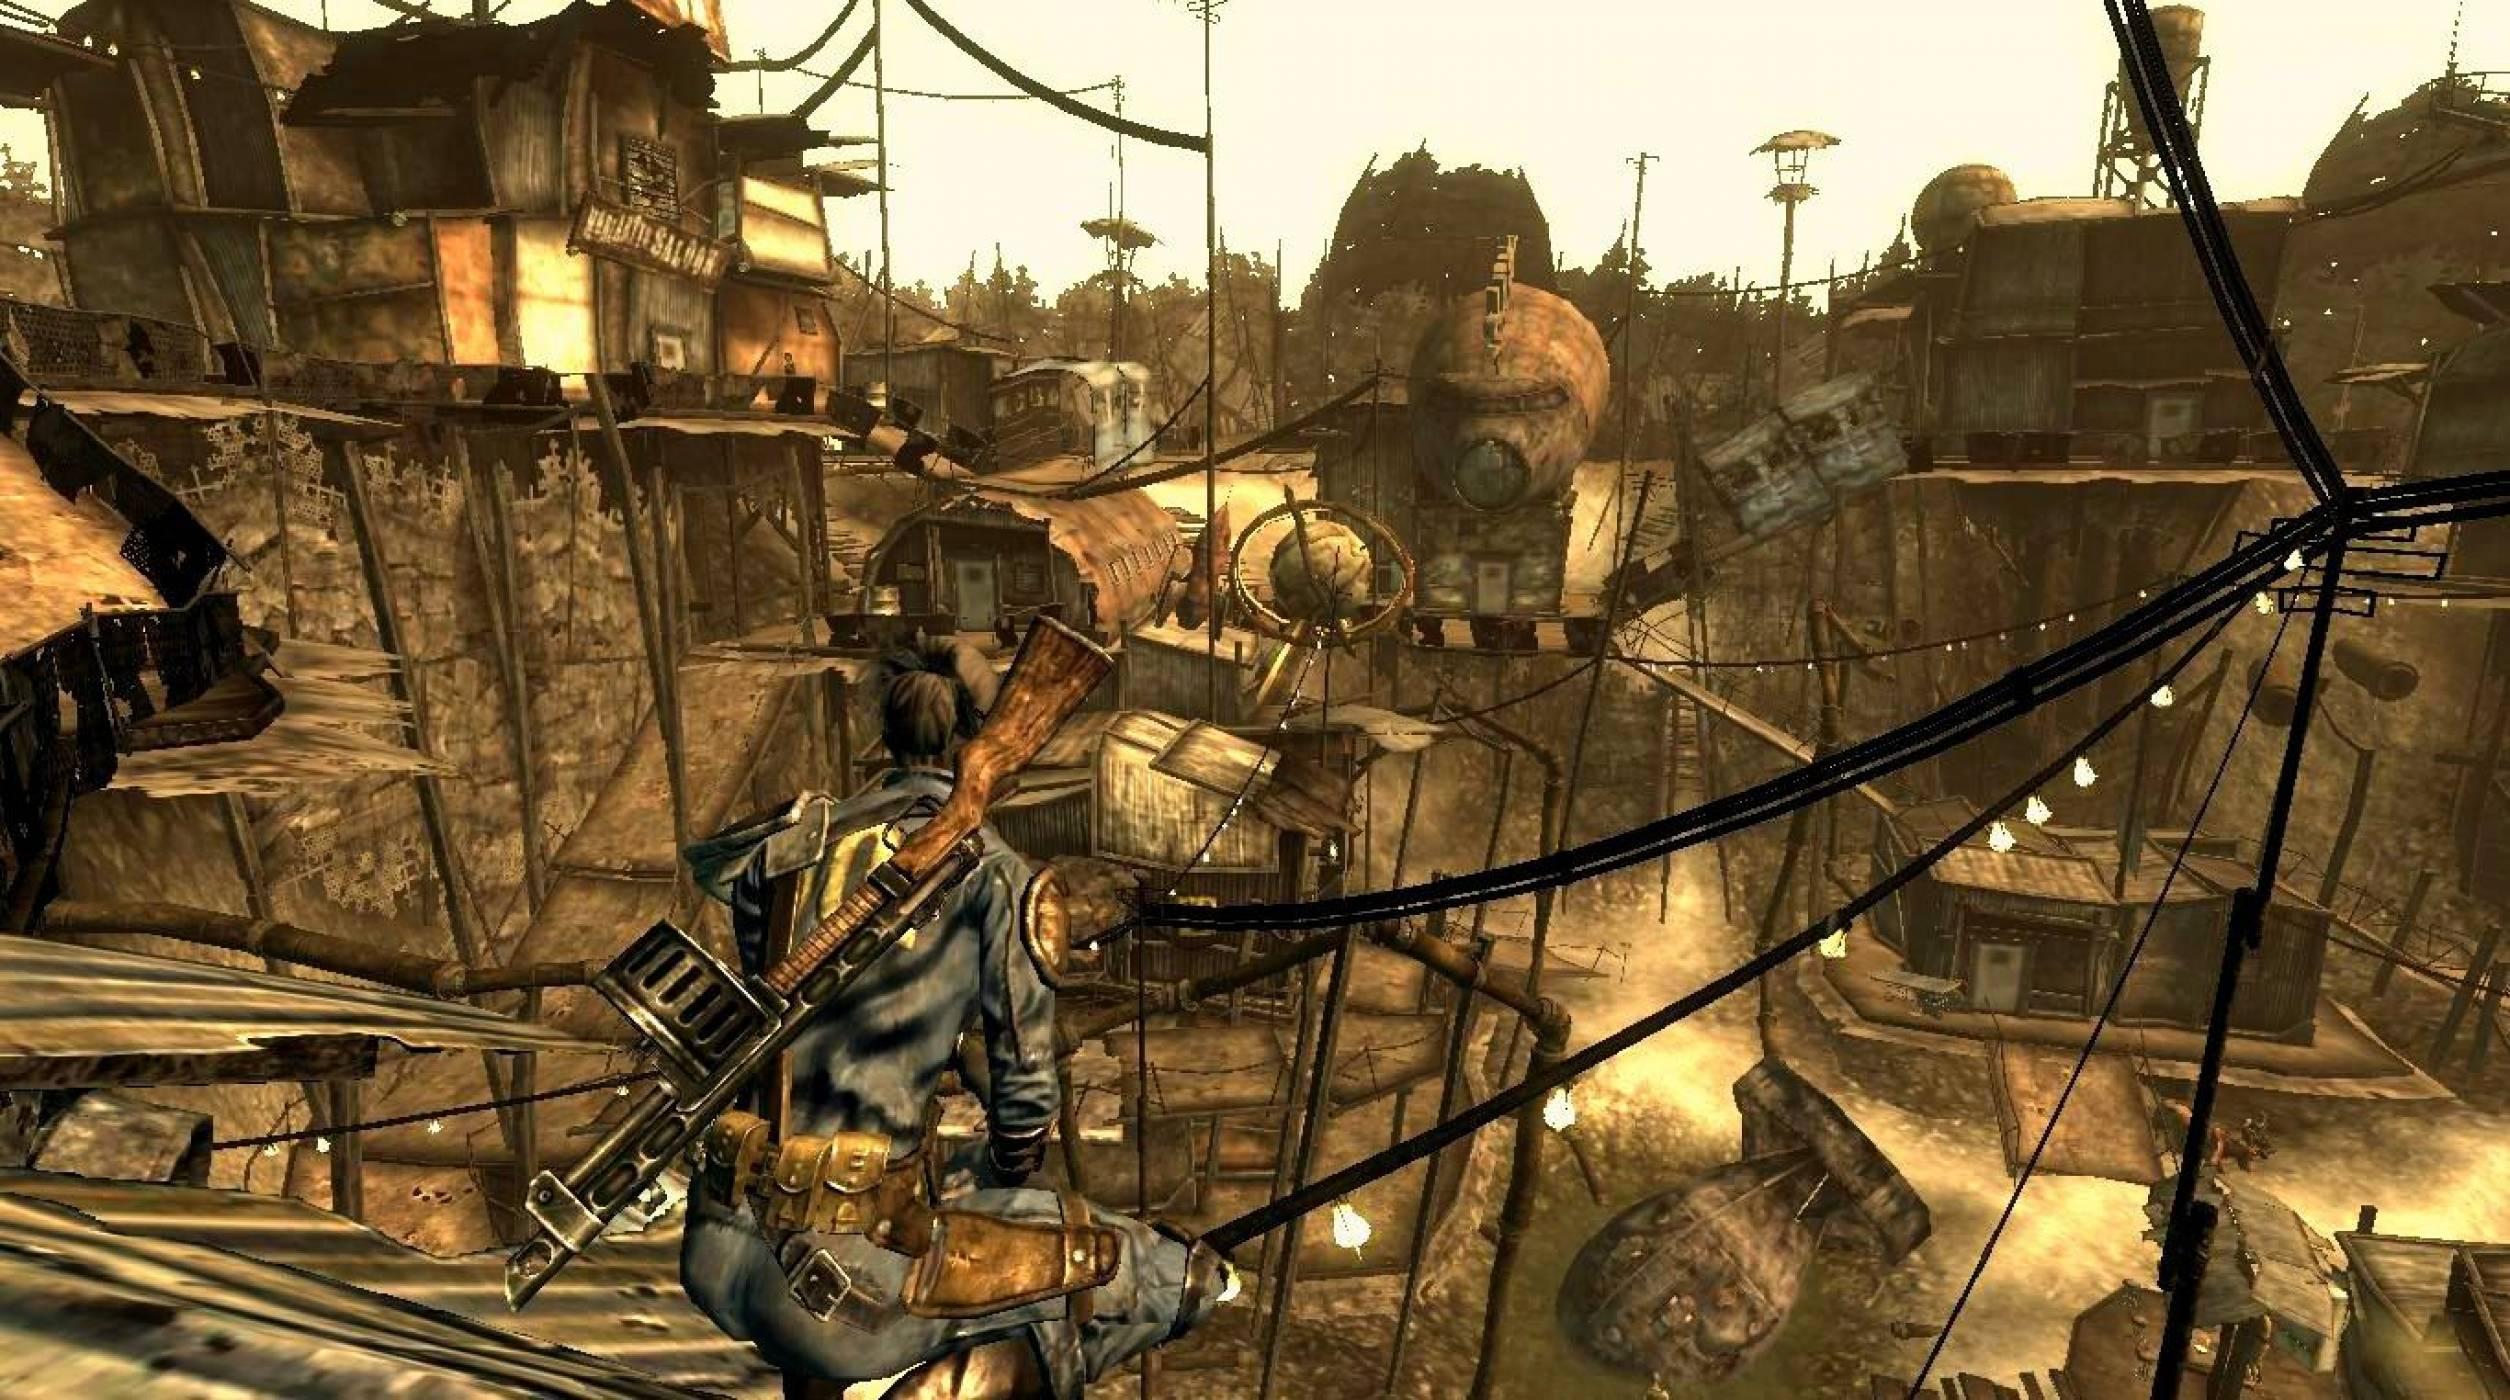 Мистериозната нова игра на Bethesda: римастър на Fallout 3 и/или New Vegas